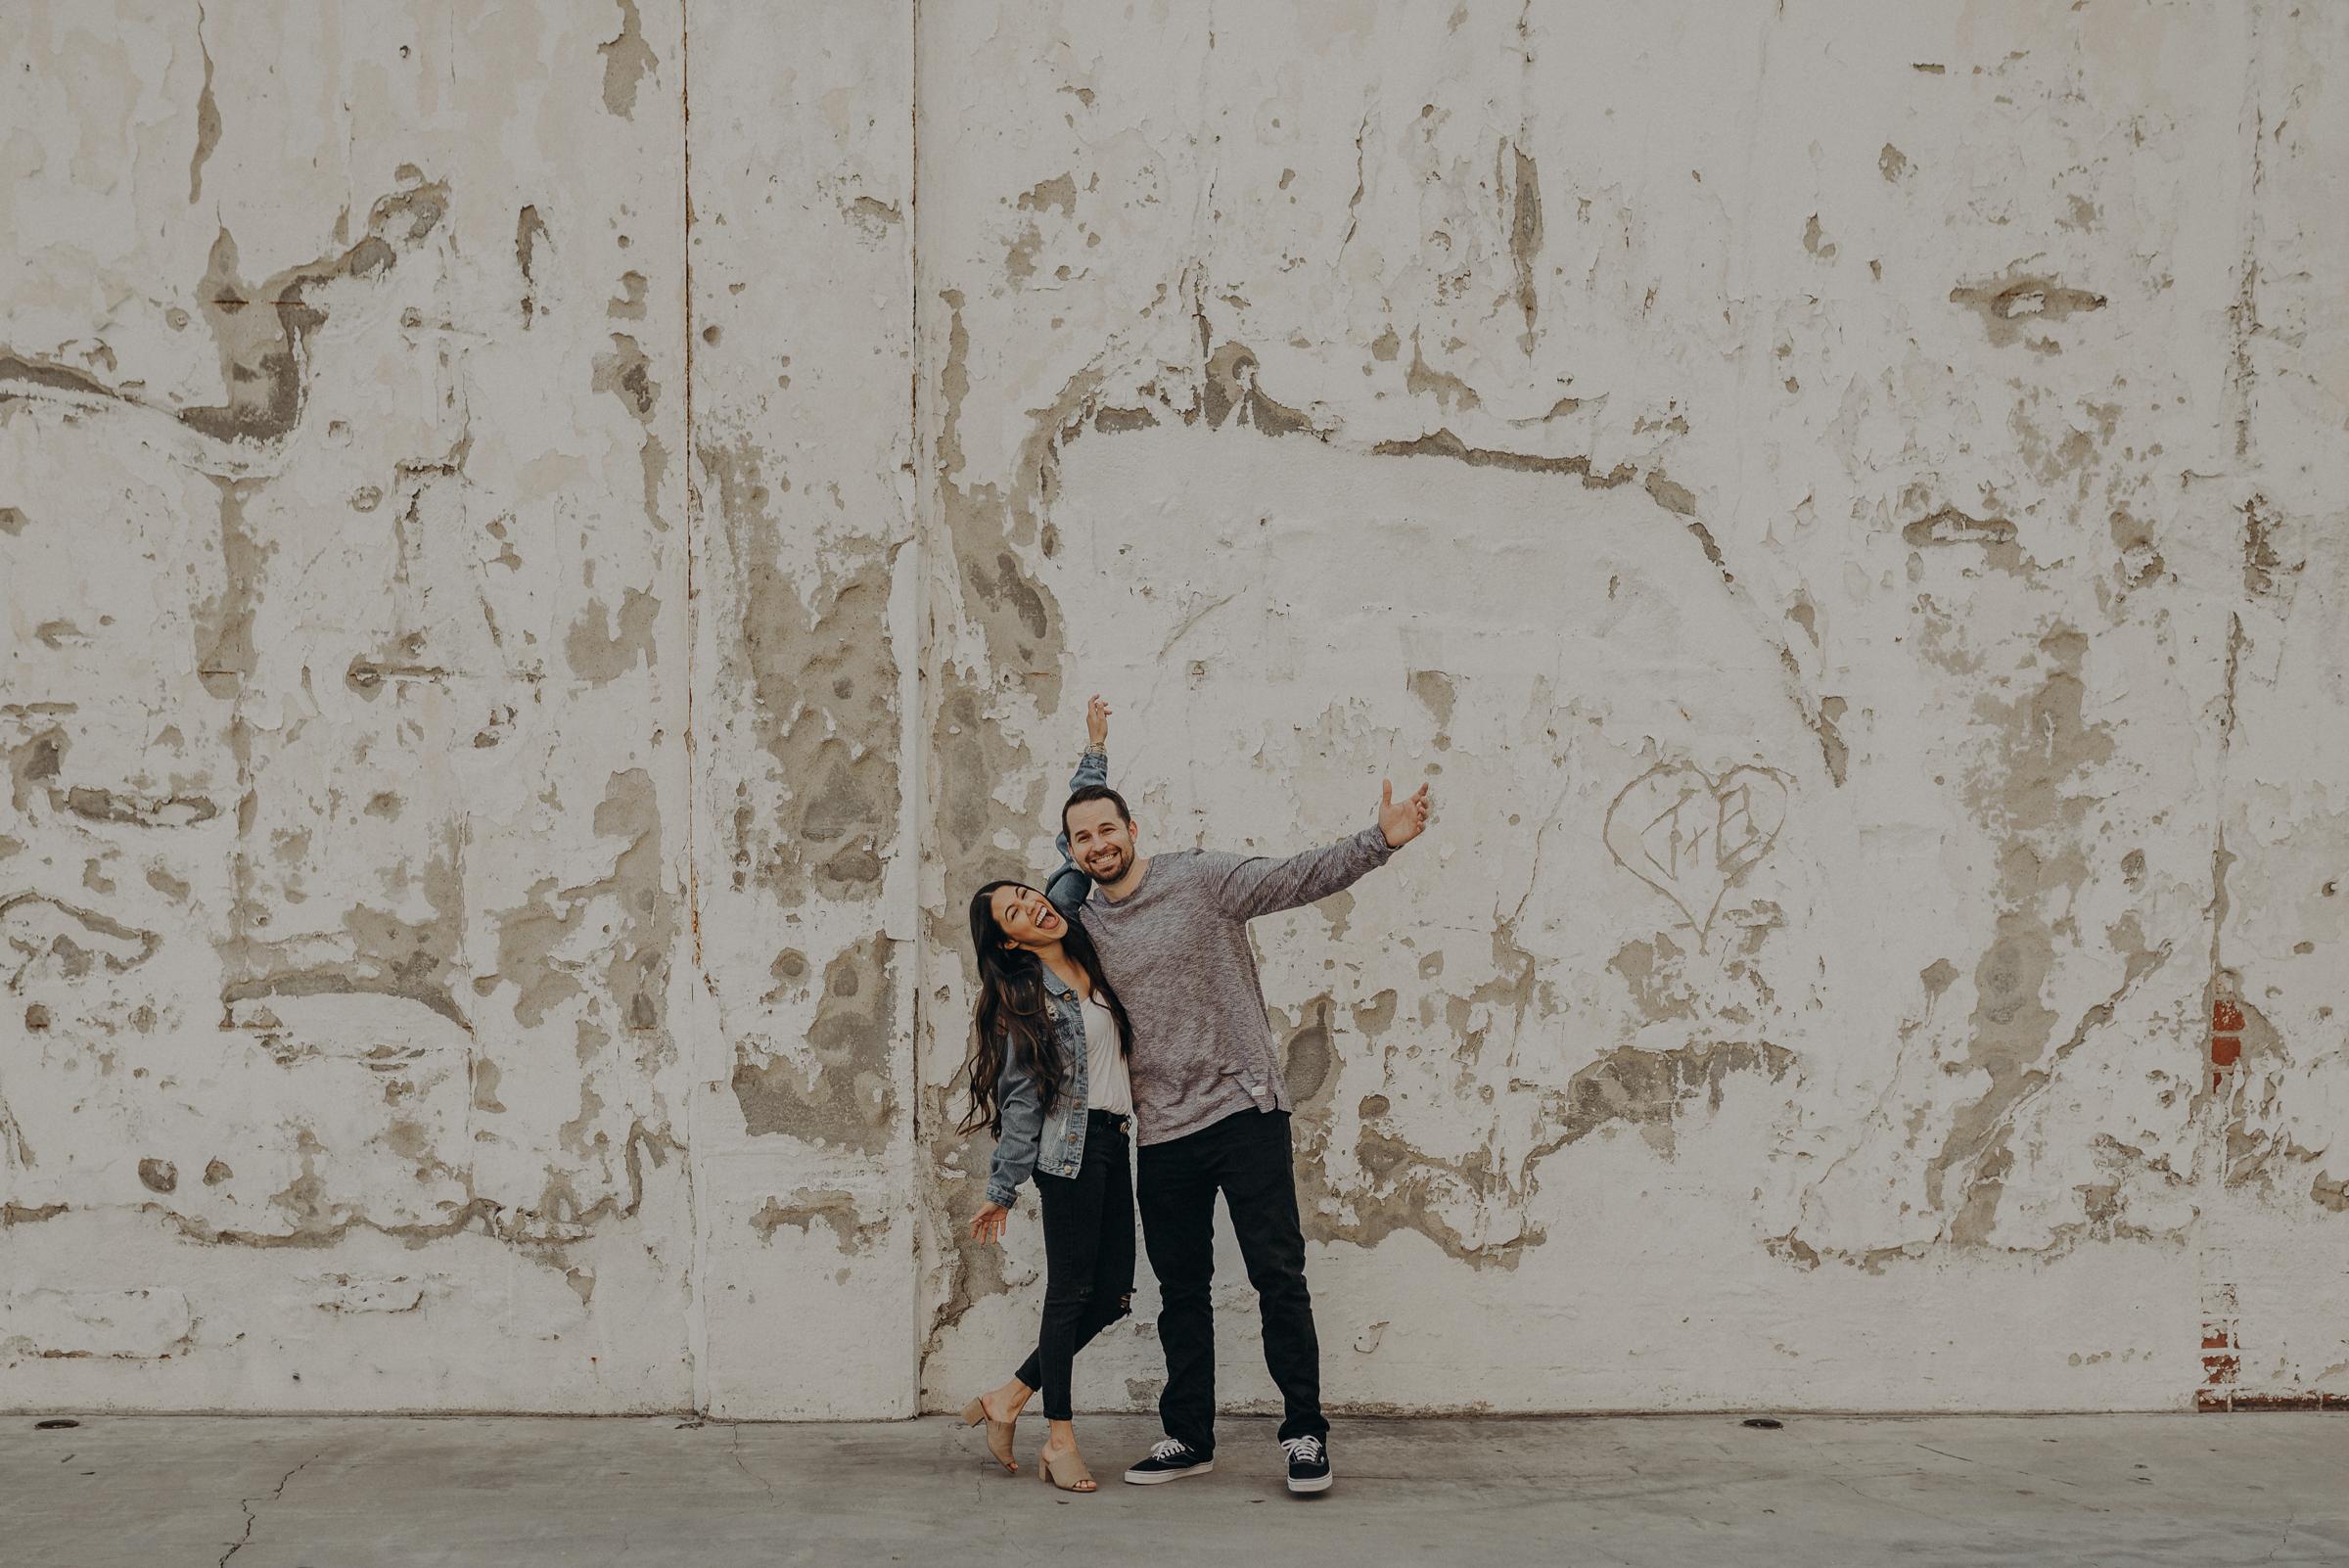 Isaiah + Taylor Photography - Los Angeles Wedding Photographer - Long Beach Engagement-018.jpg